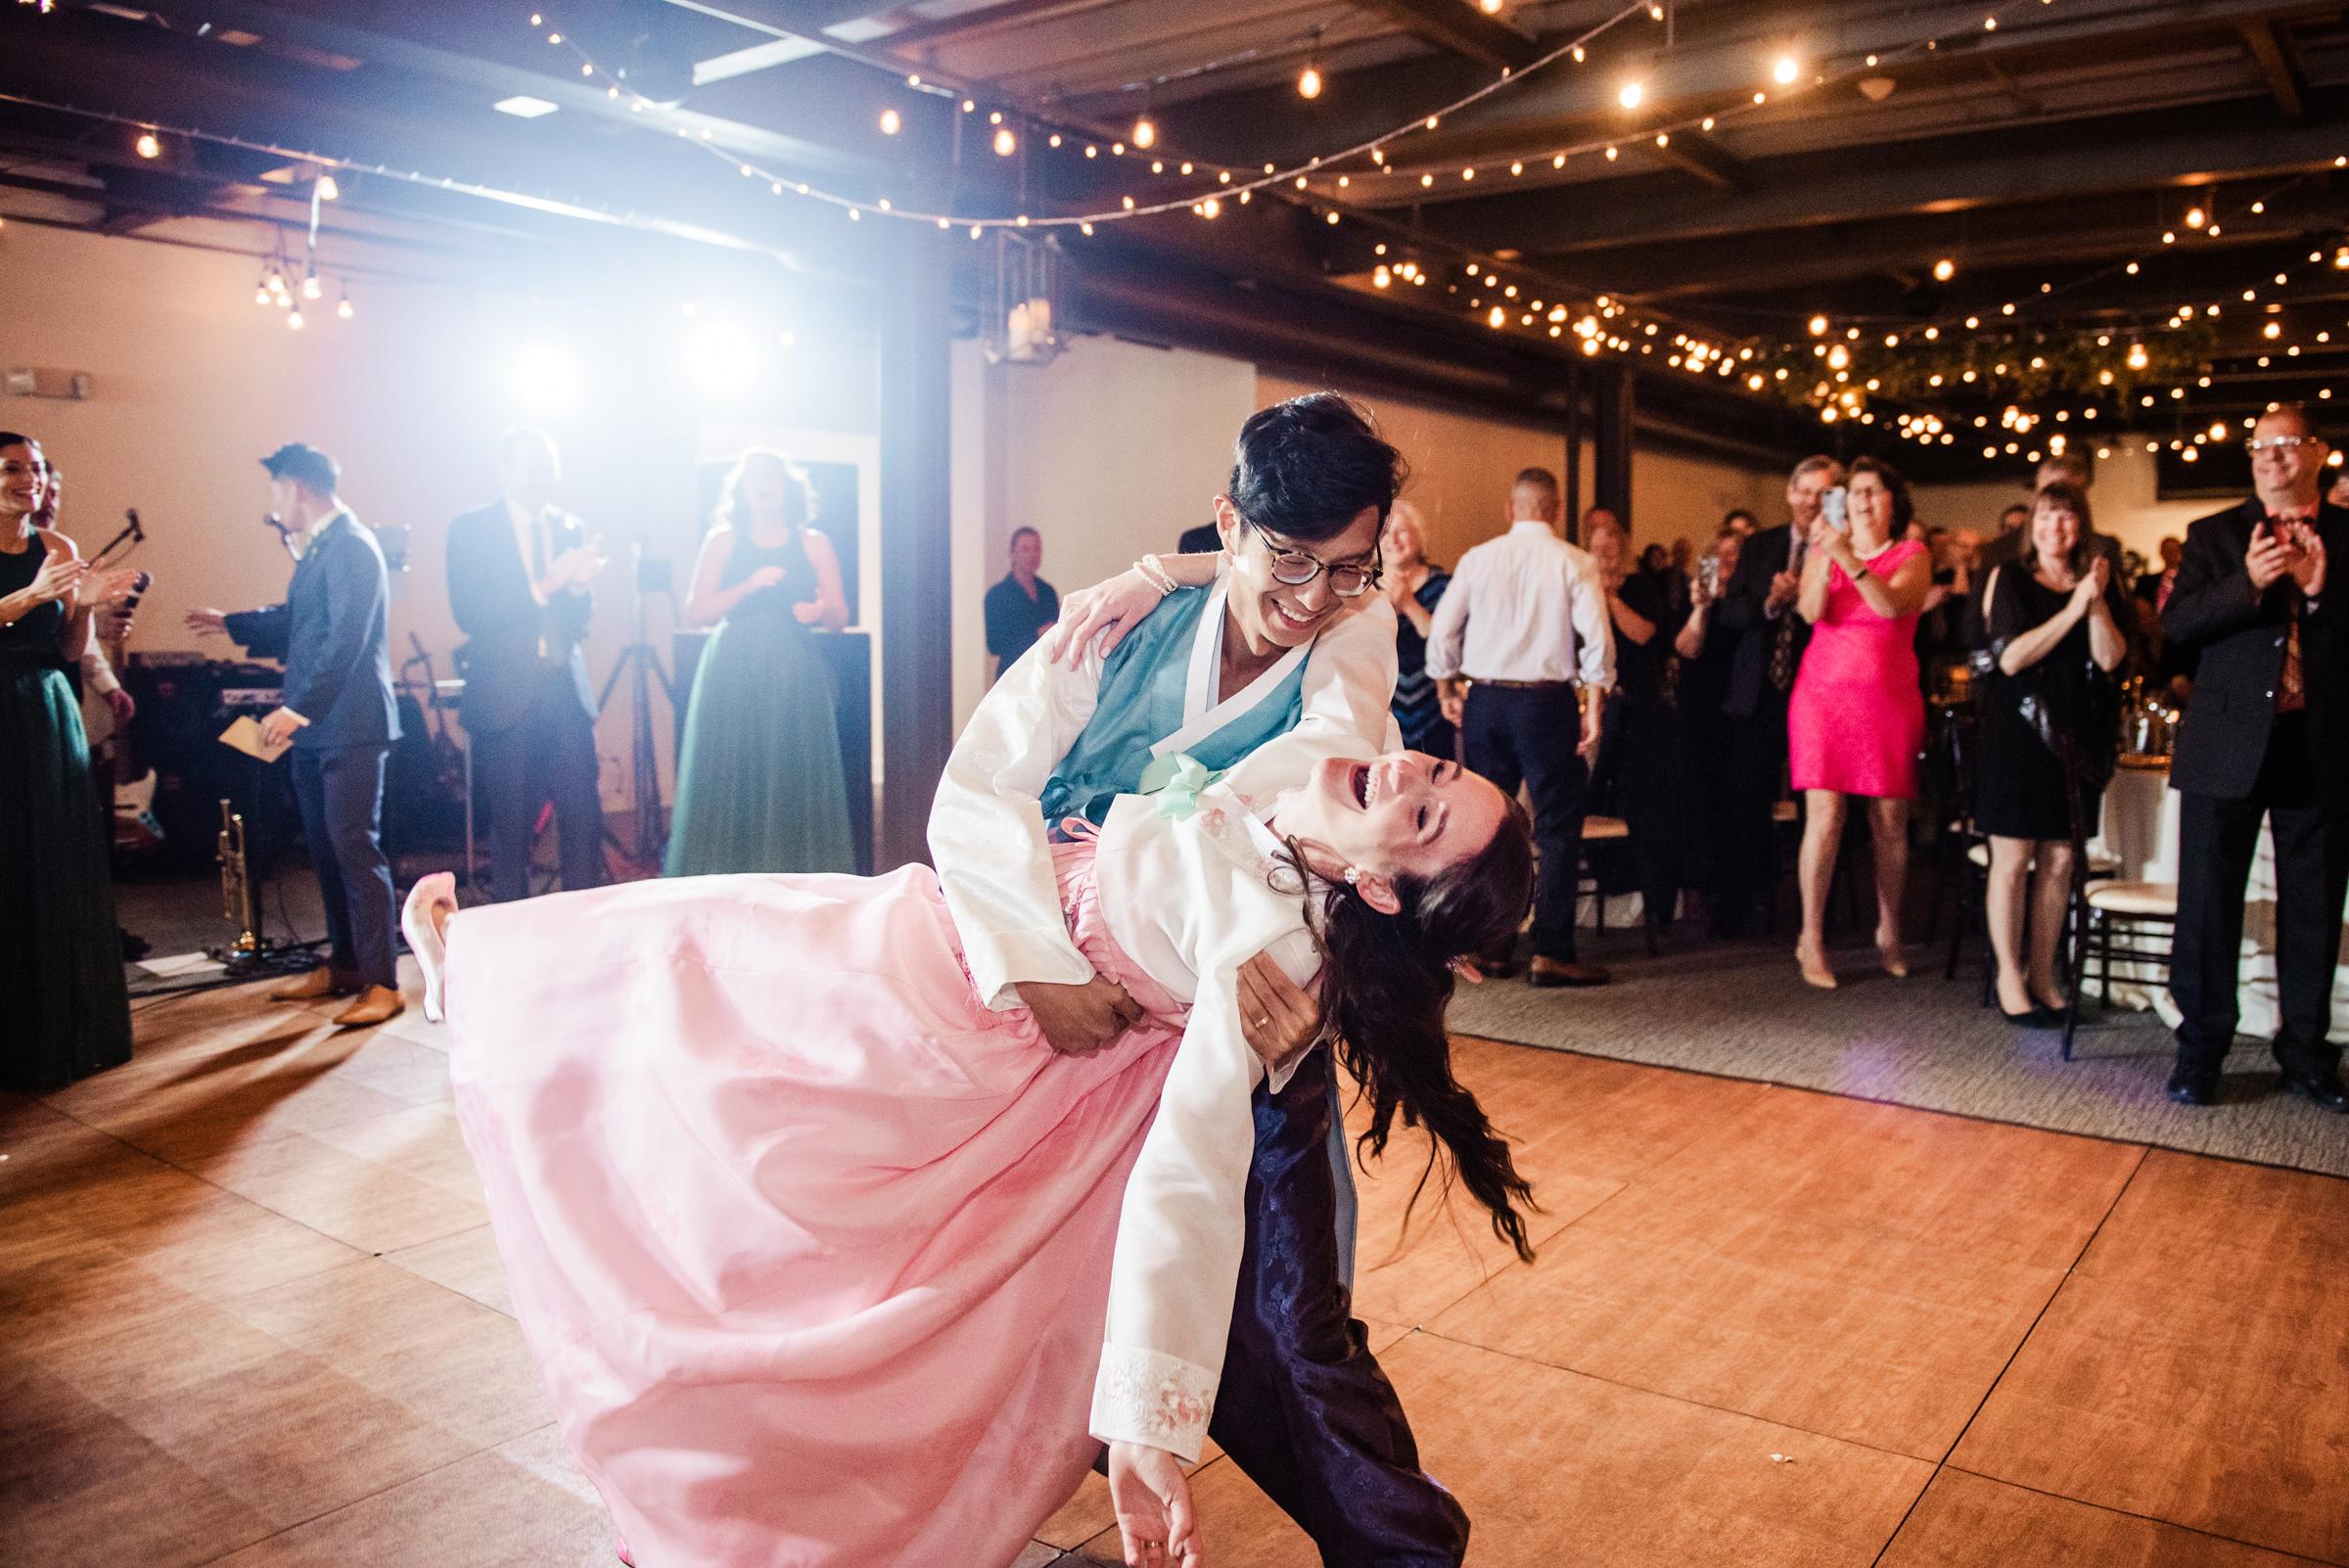 SKY_Armory_Syracuse_Wedding_JILL_STUDIO_Rochester_NY_Photographer_DSC_6128.jpg